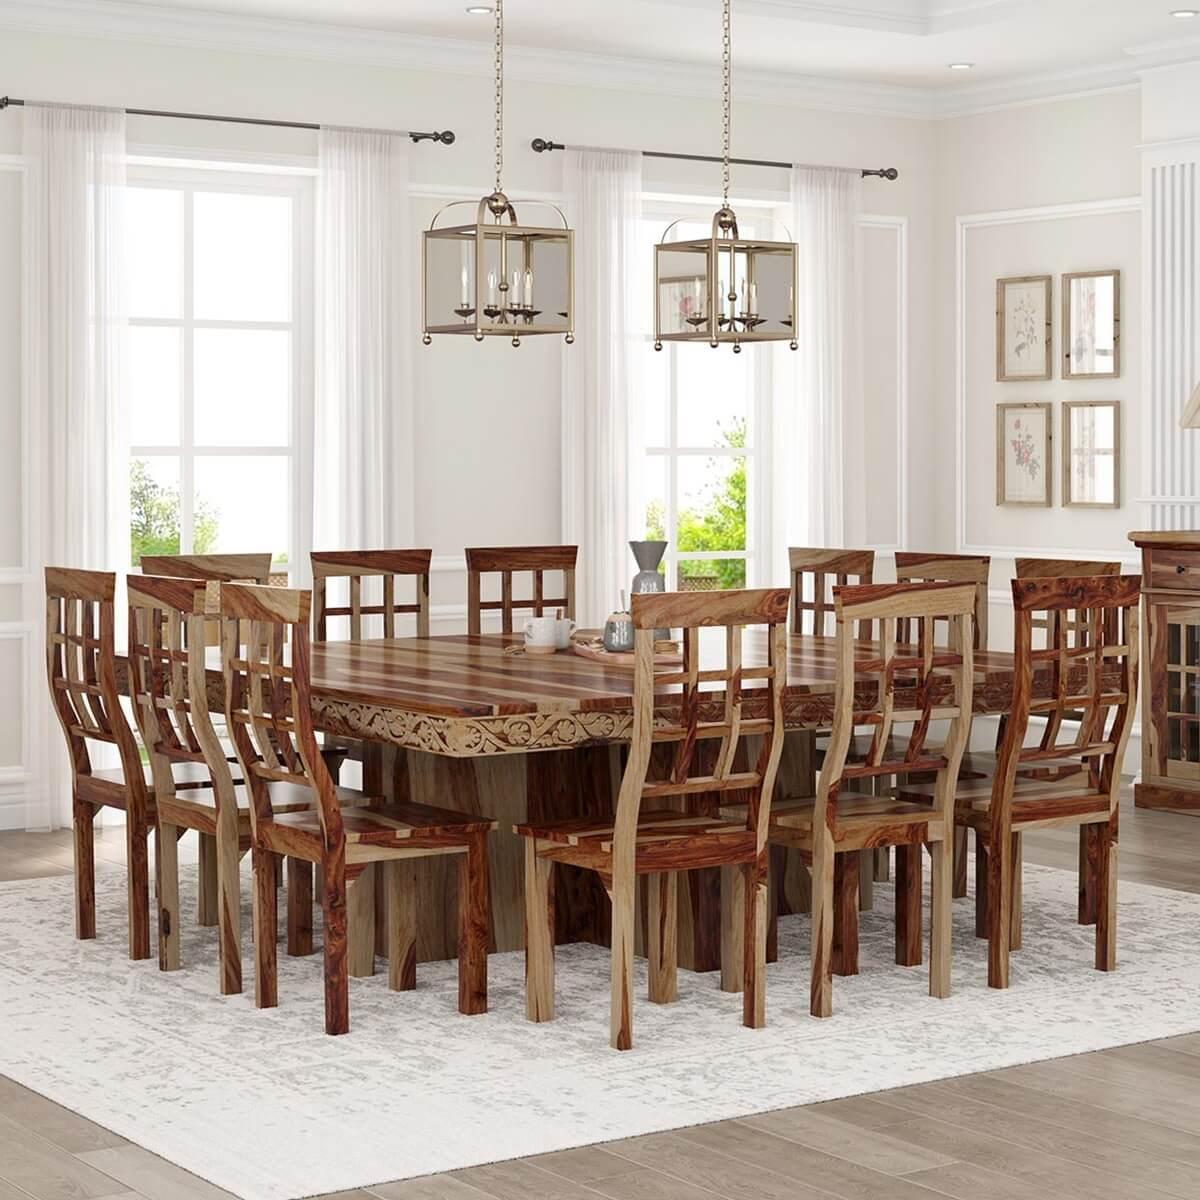 Large Dining Room Sets